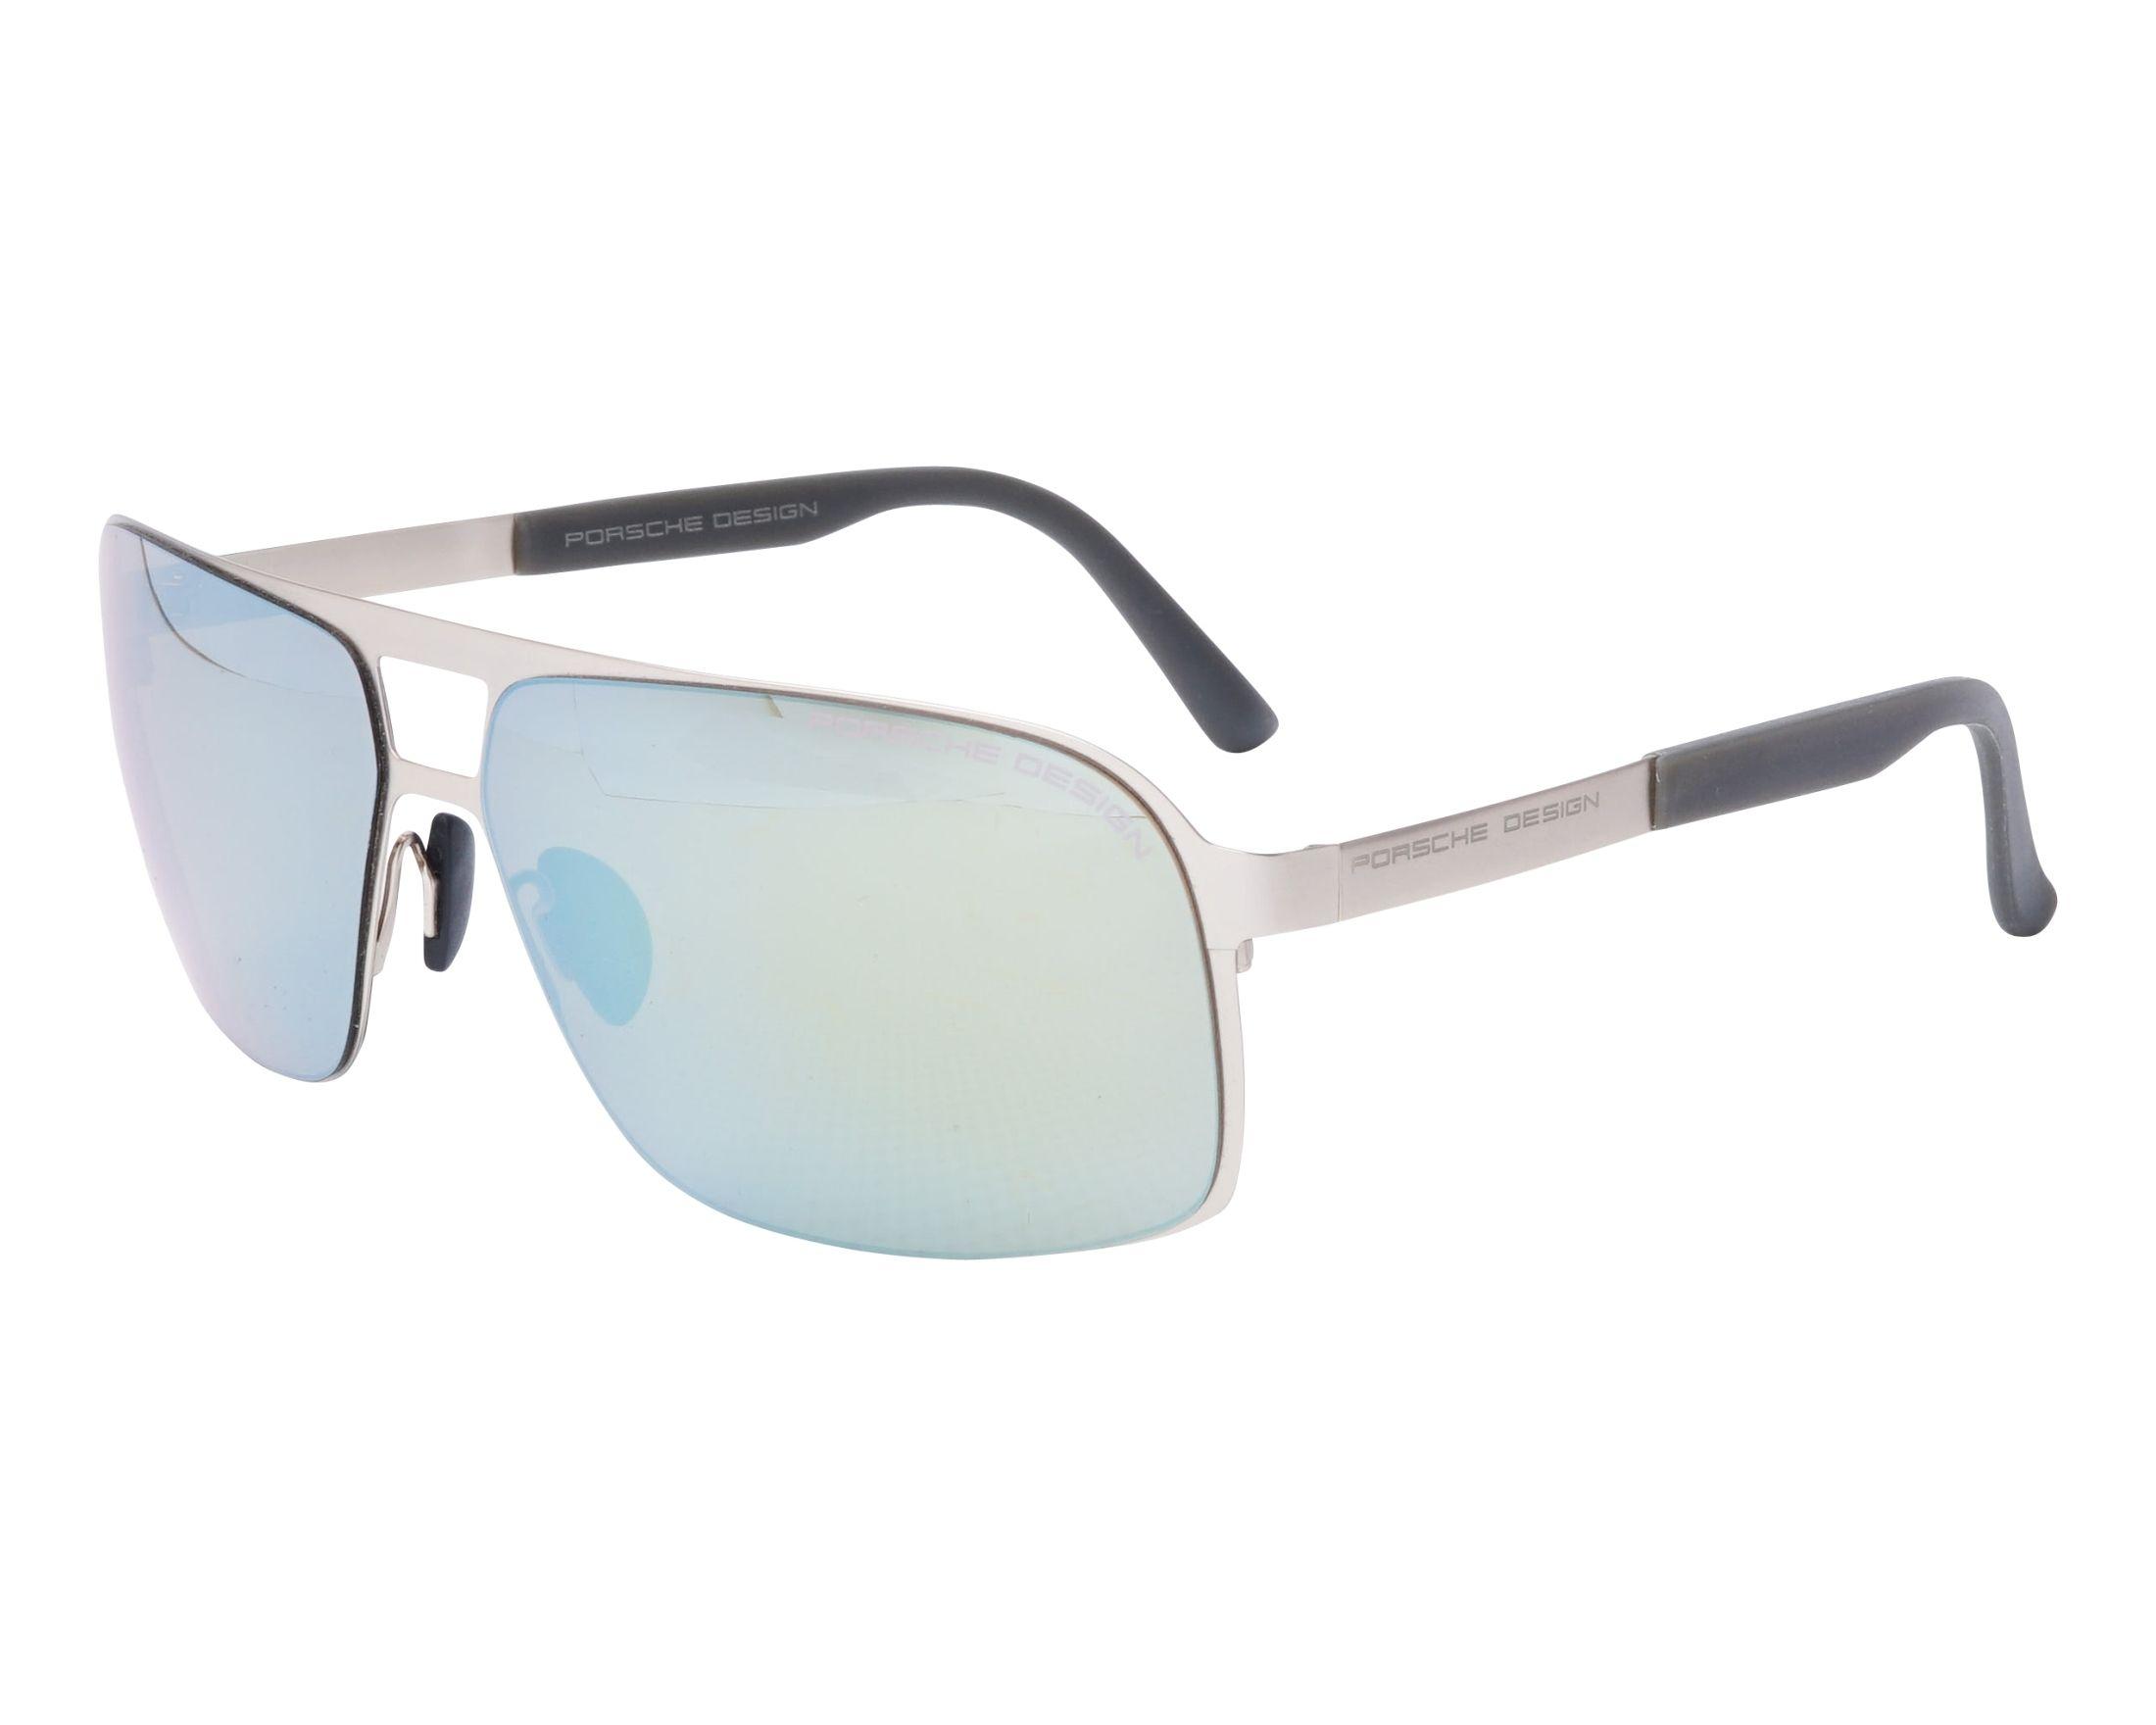 lunettes de soleil porsche design p 8579 a or visionet. Black Bedroom Furniture Sets. Home Design Ideas